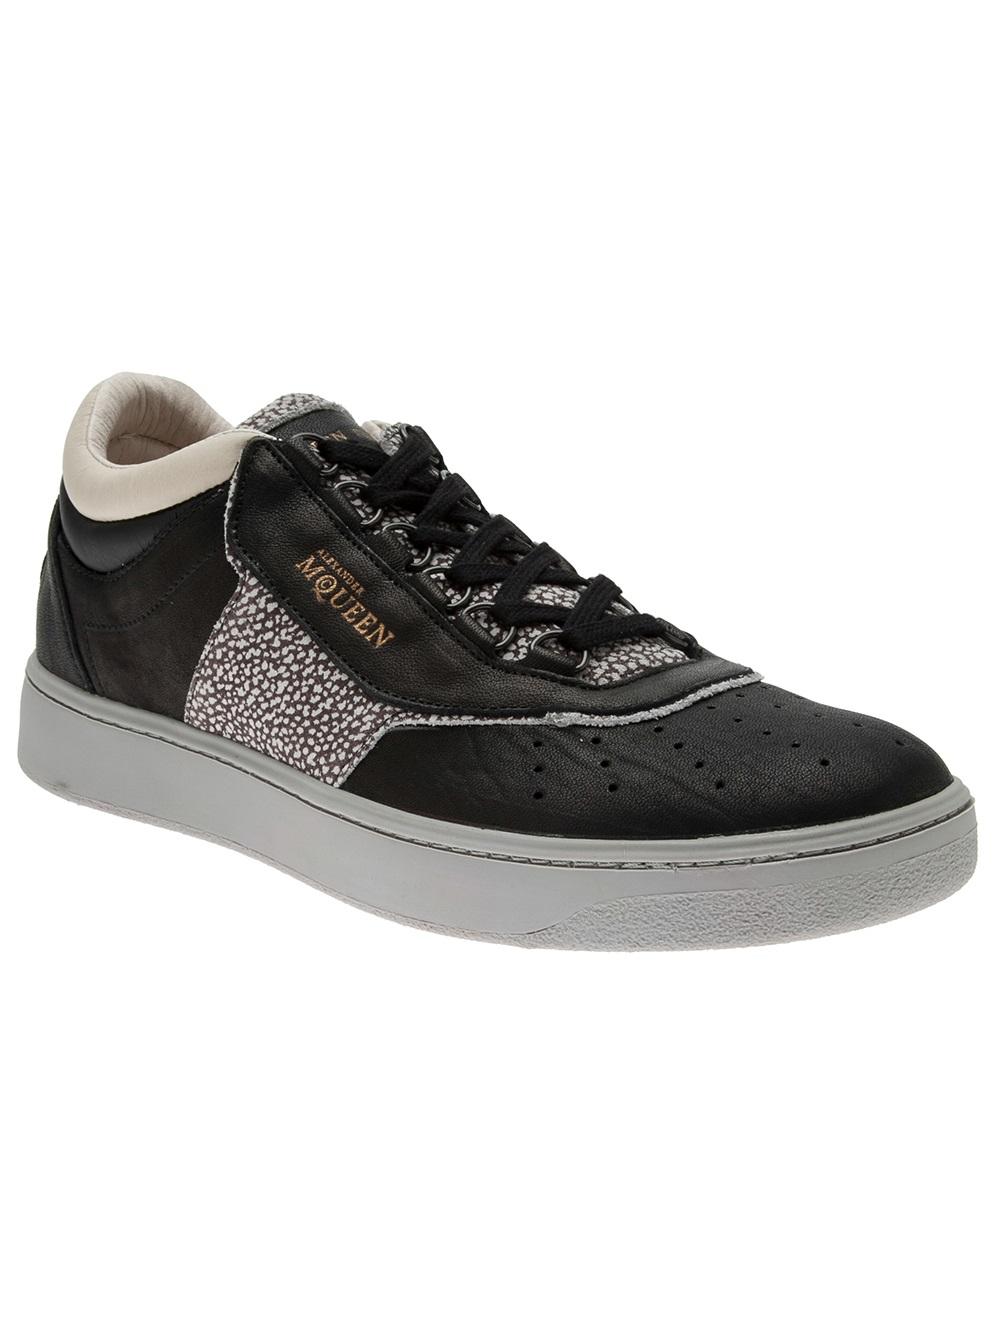 Lyst - Alexander McQueen X Puma Joust Lo Iii Sneaker in Black for Men 4b76164c8